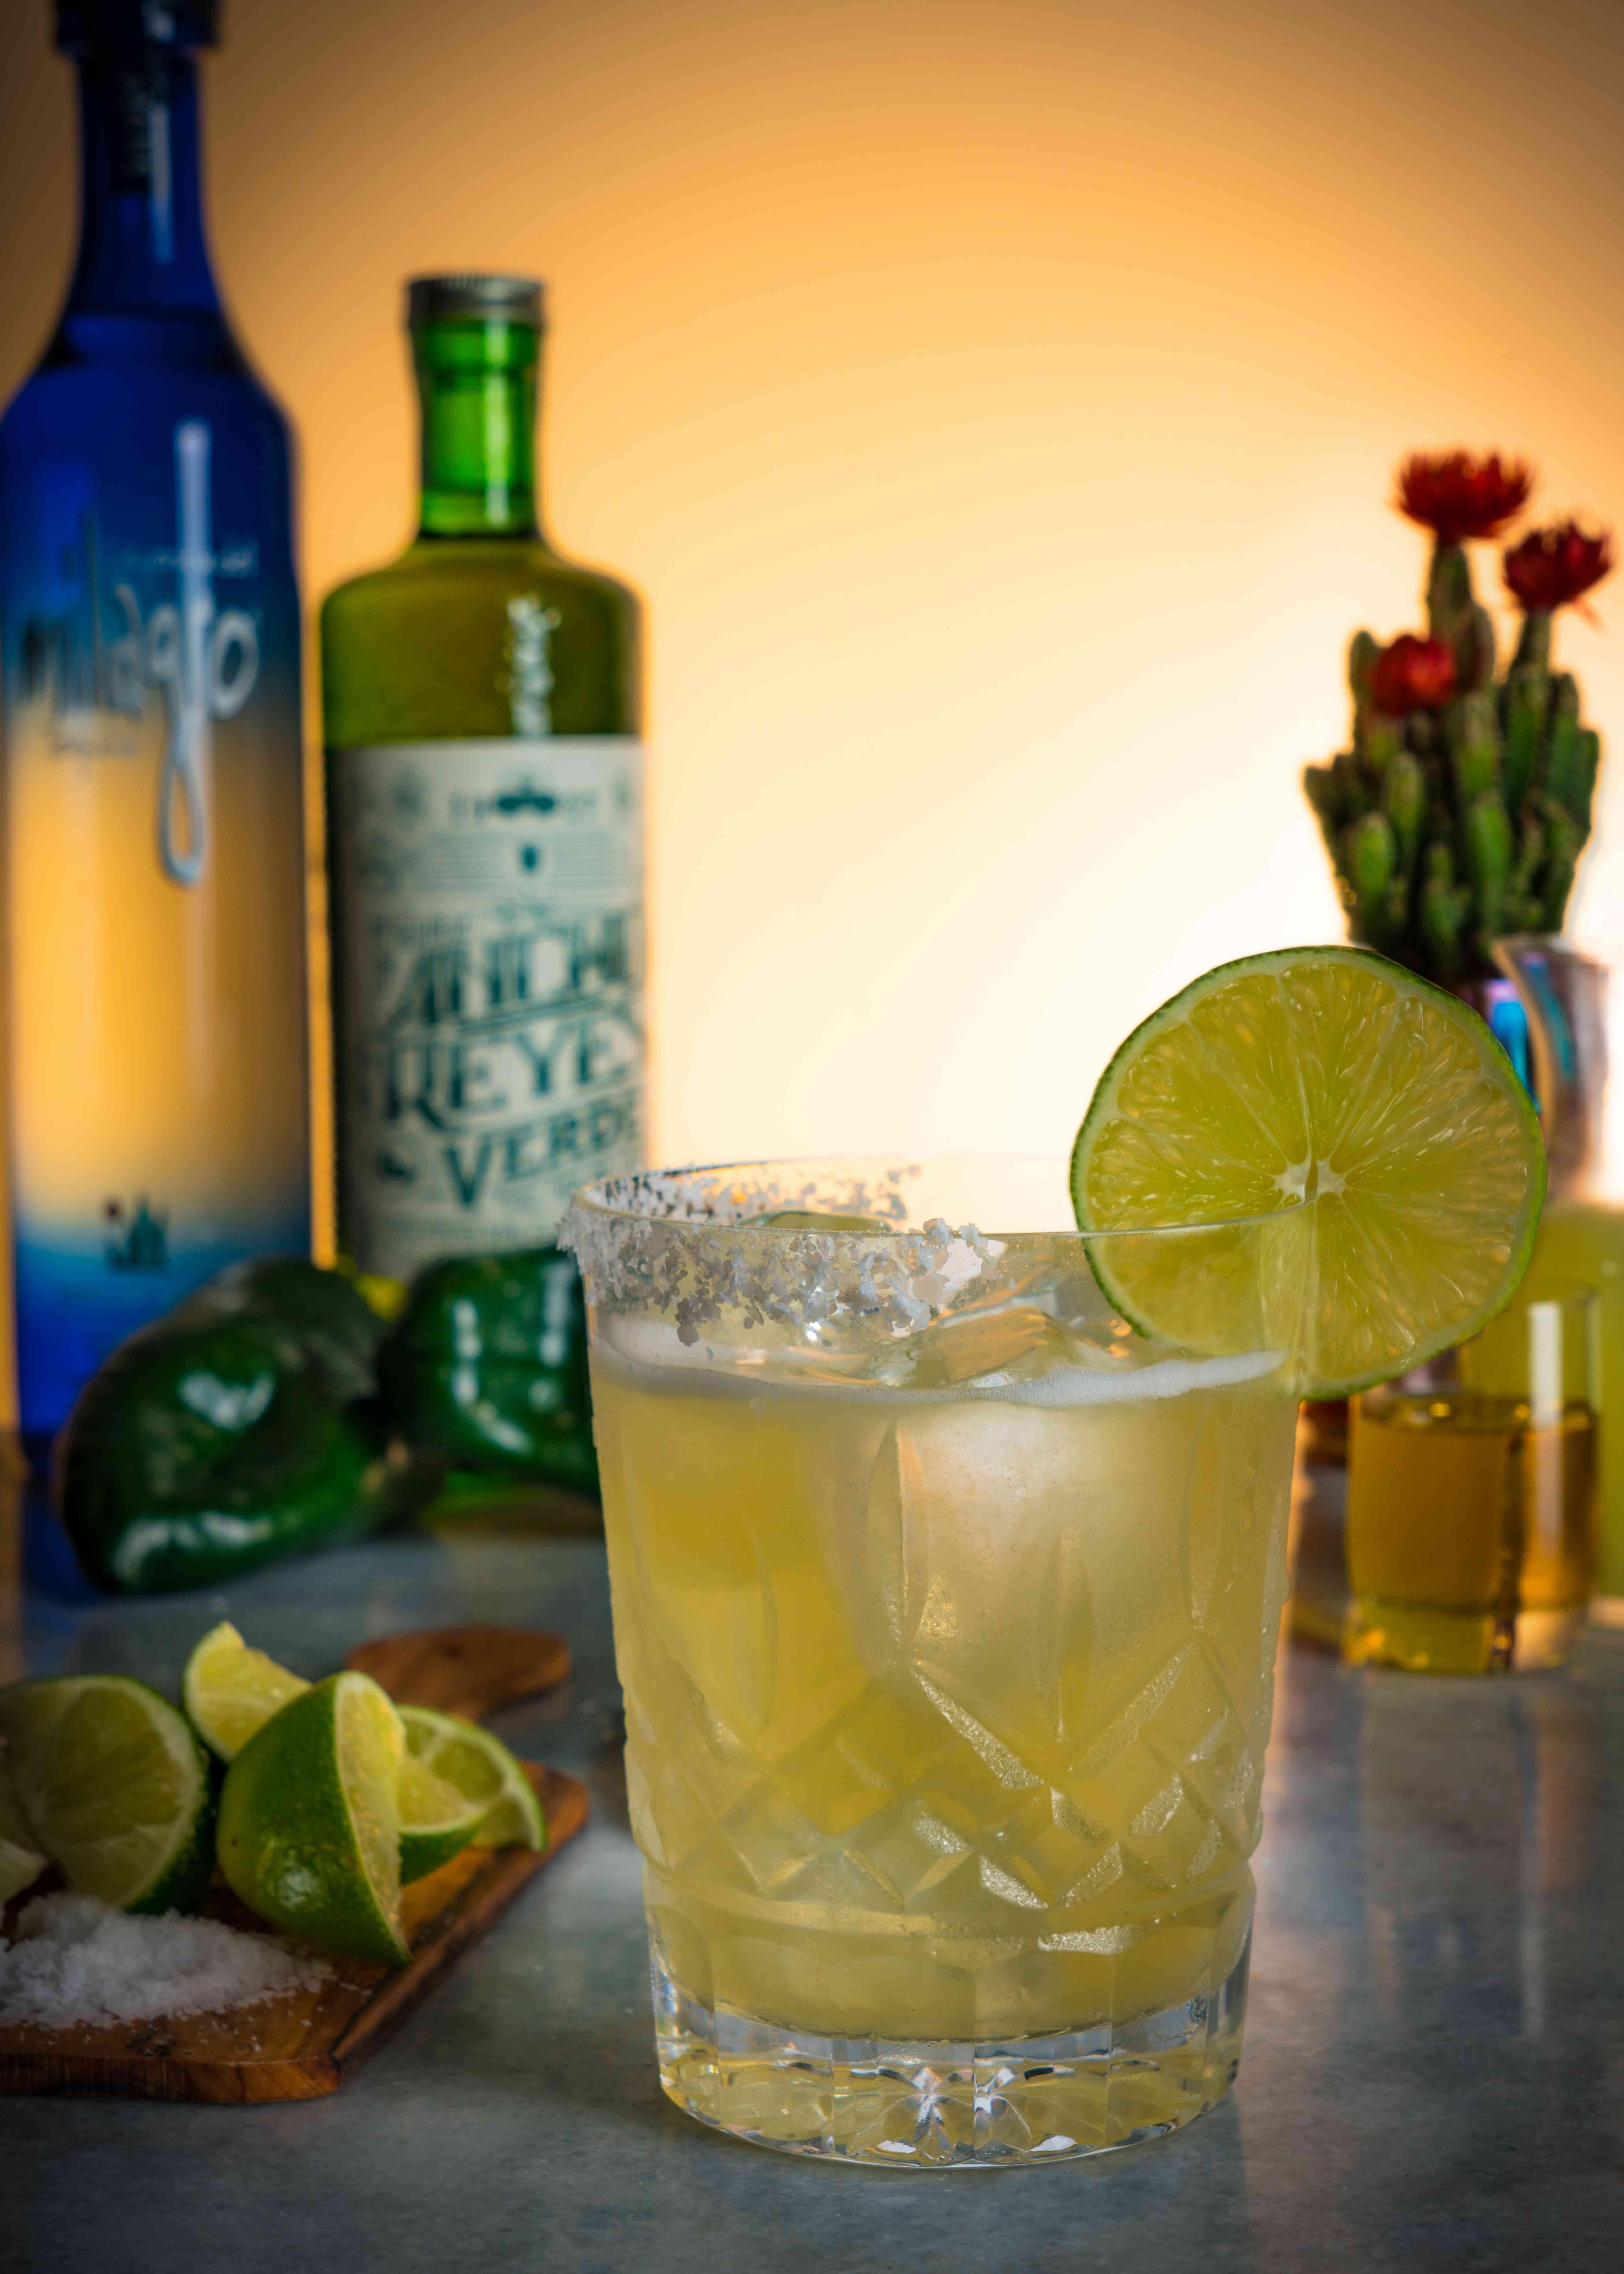 alcohol, signature cocktails, drink, glass, margarita, tequila, mezcal, lime, garnish, citrus